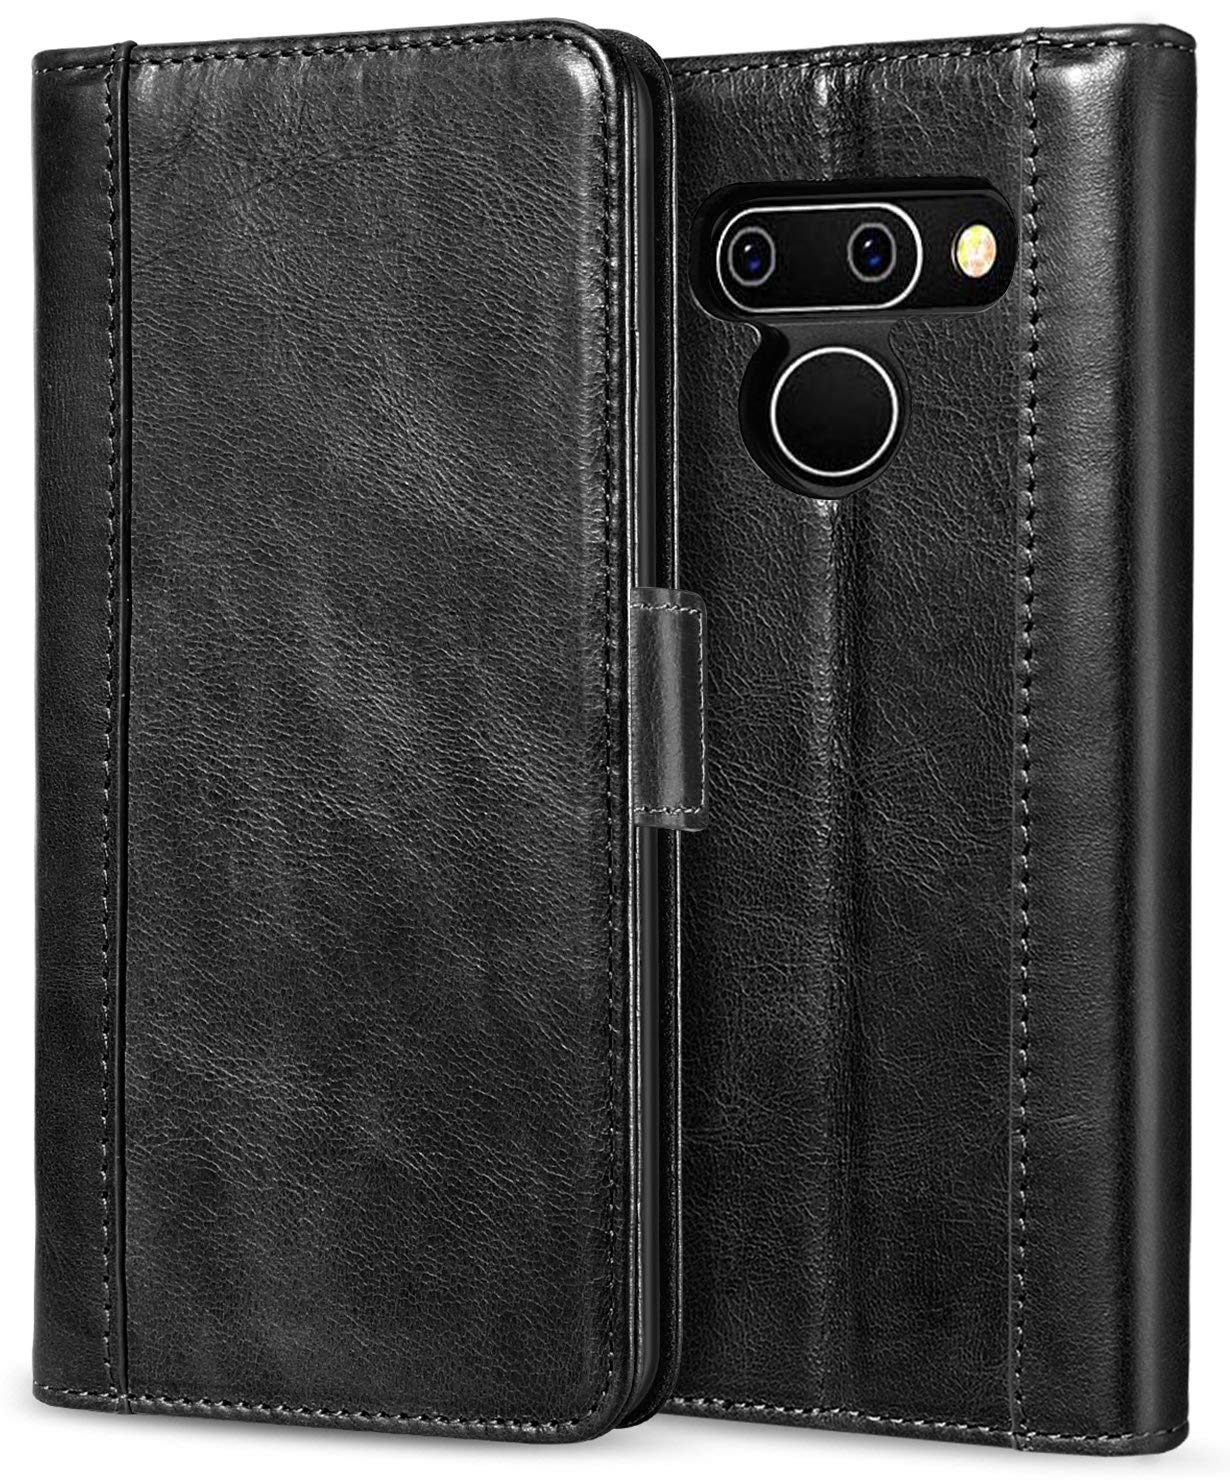 ProCase LG G8 ThinQレザーケースウォレット、フリップケースフォリオカバー付きキックスタンド付きカードホルダーマグネットクロージャ、LG G8 / LG G8 ThinQ 2019用 - ブラック   B07PF8WGLC